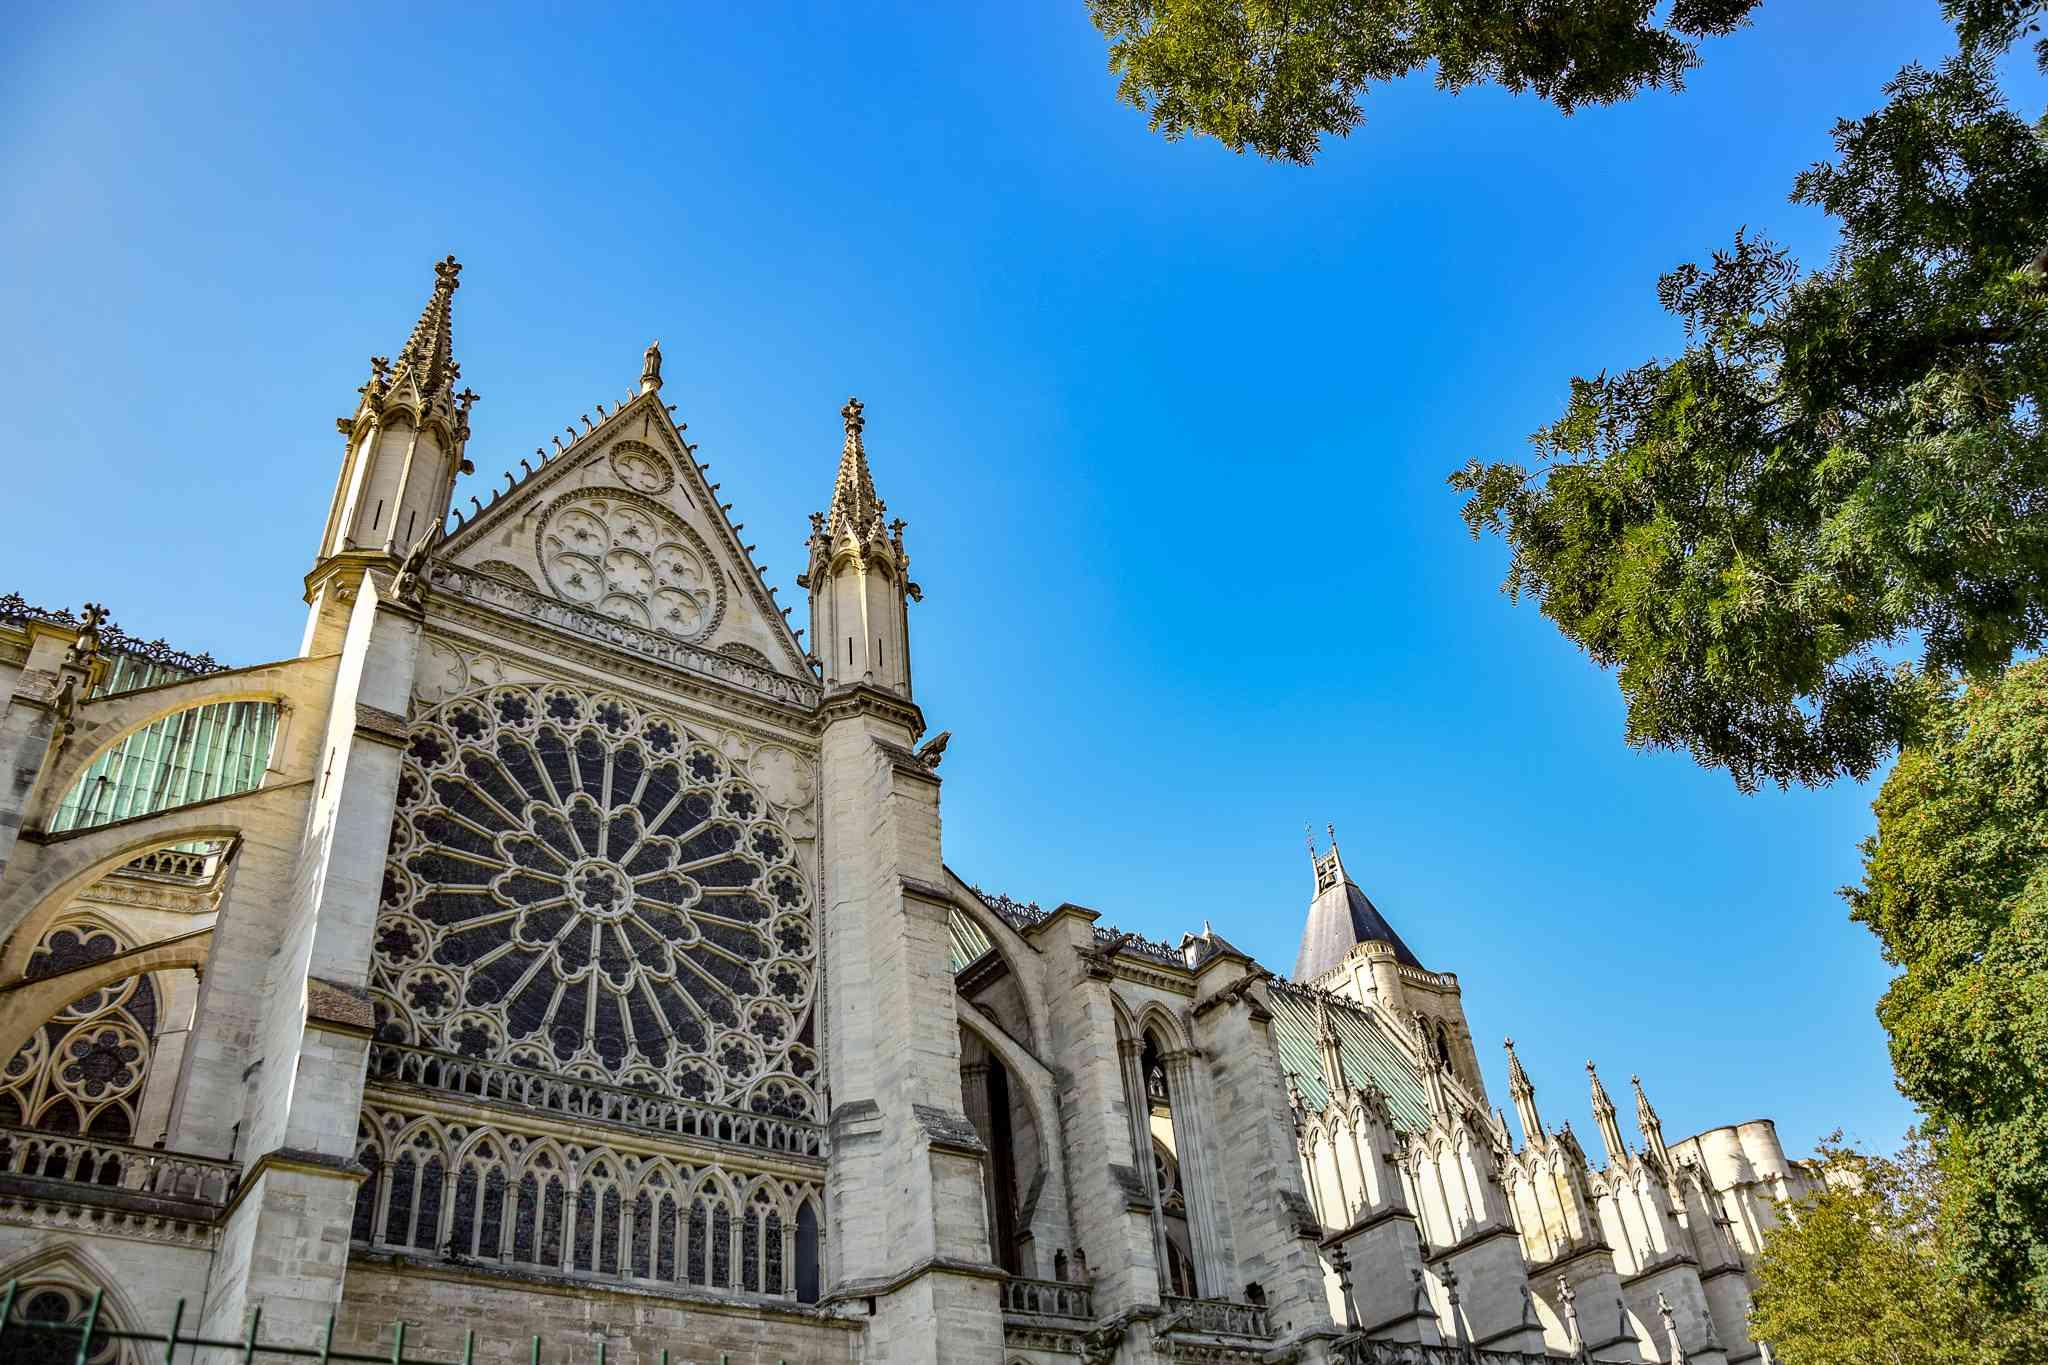 Basilica Cathedral of Saint-Denis, Paris, France